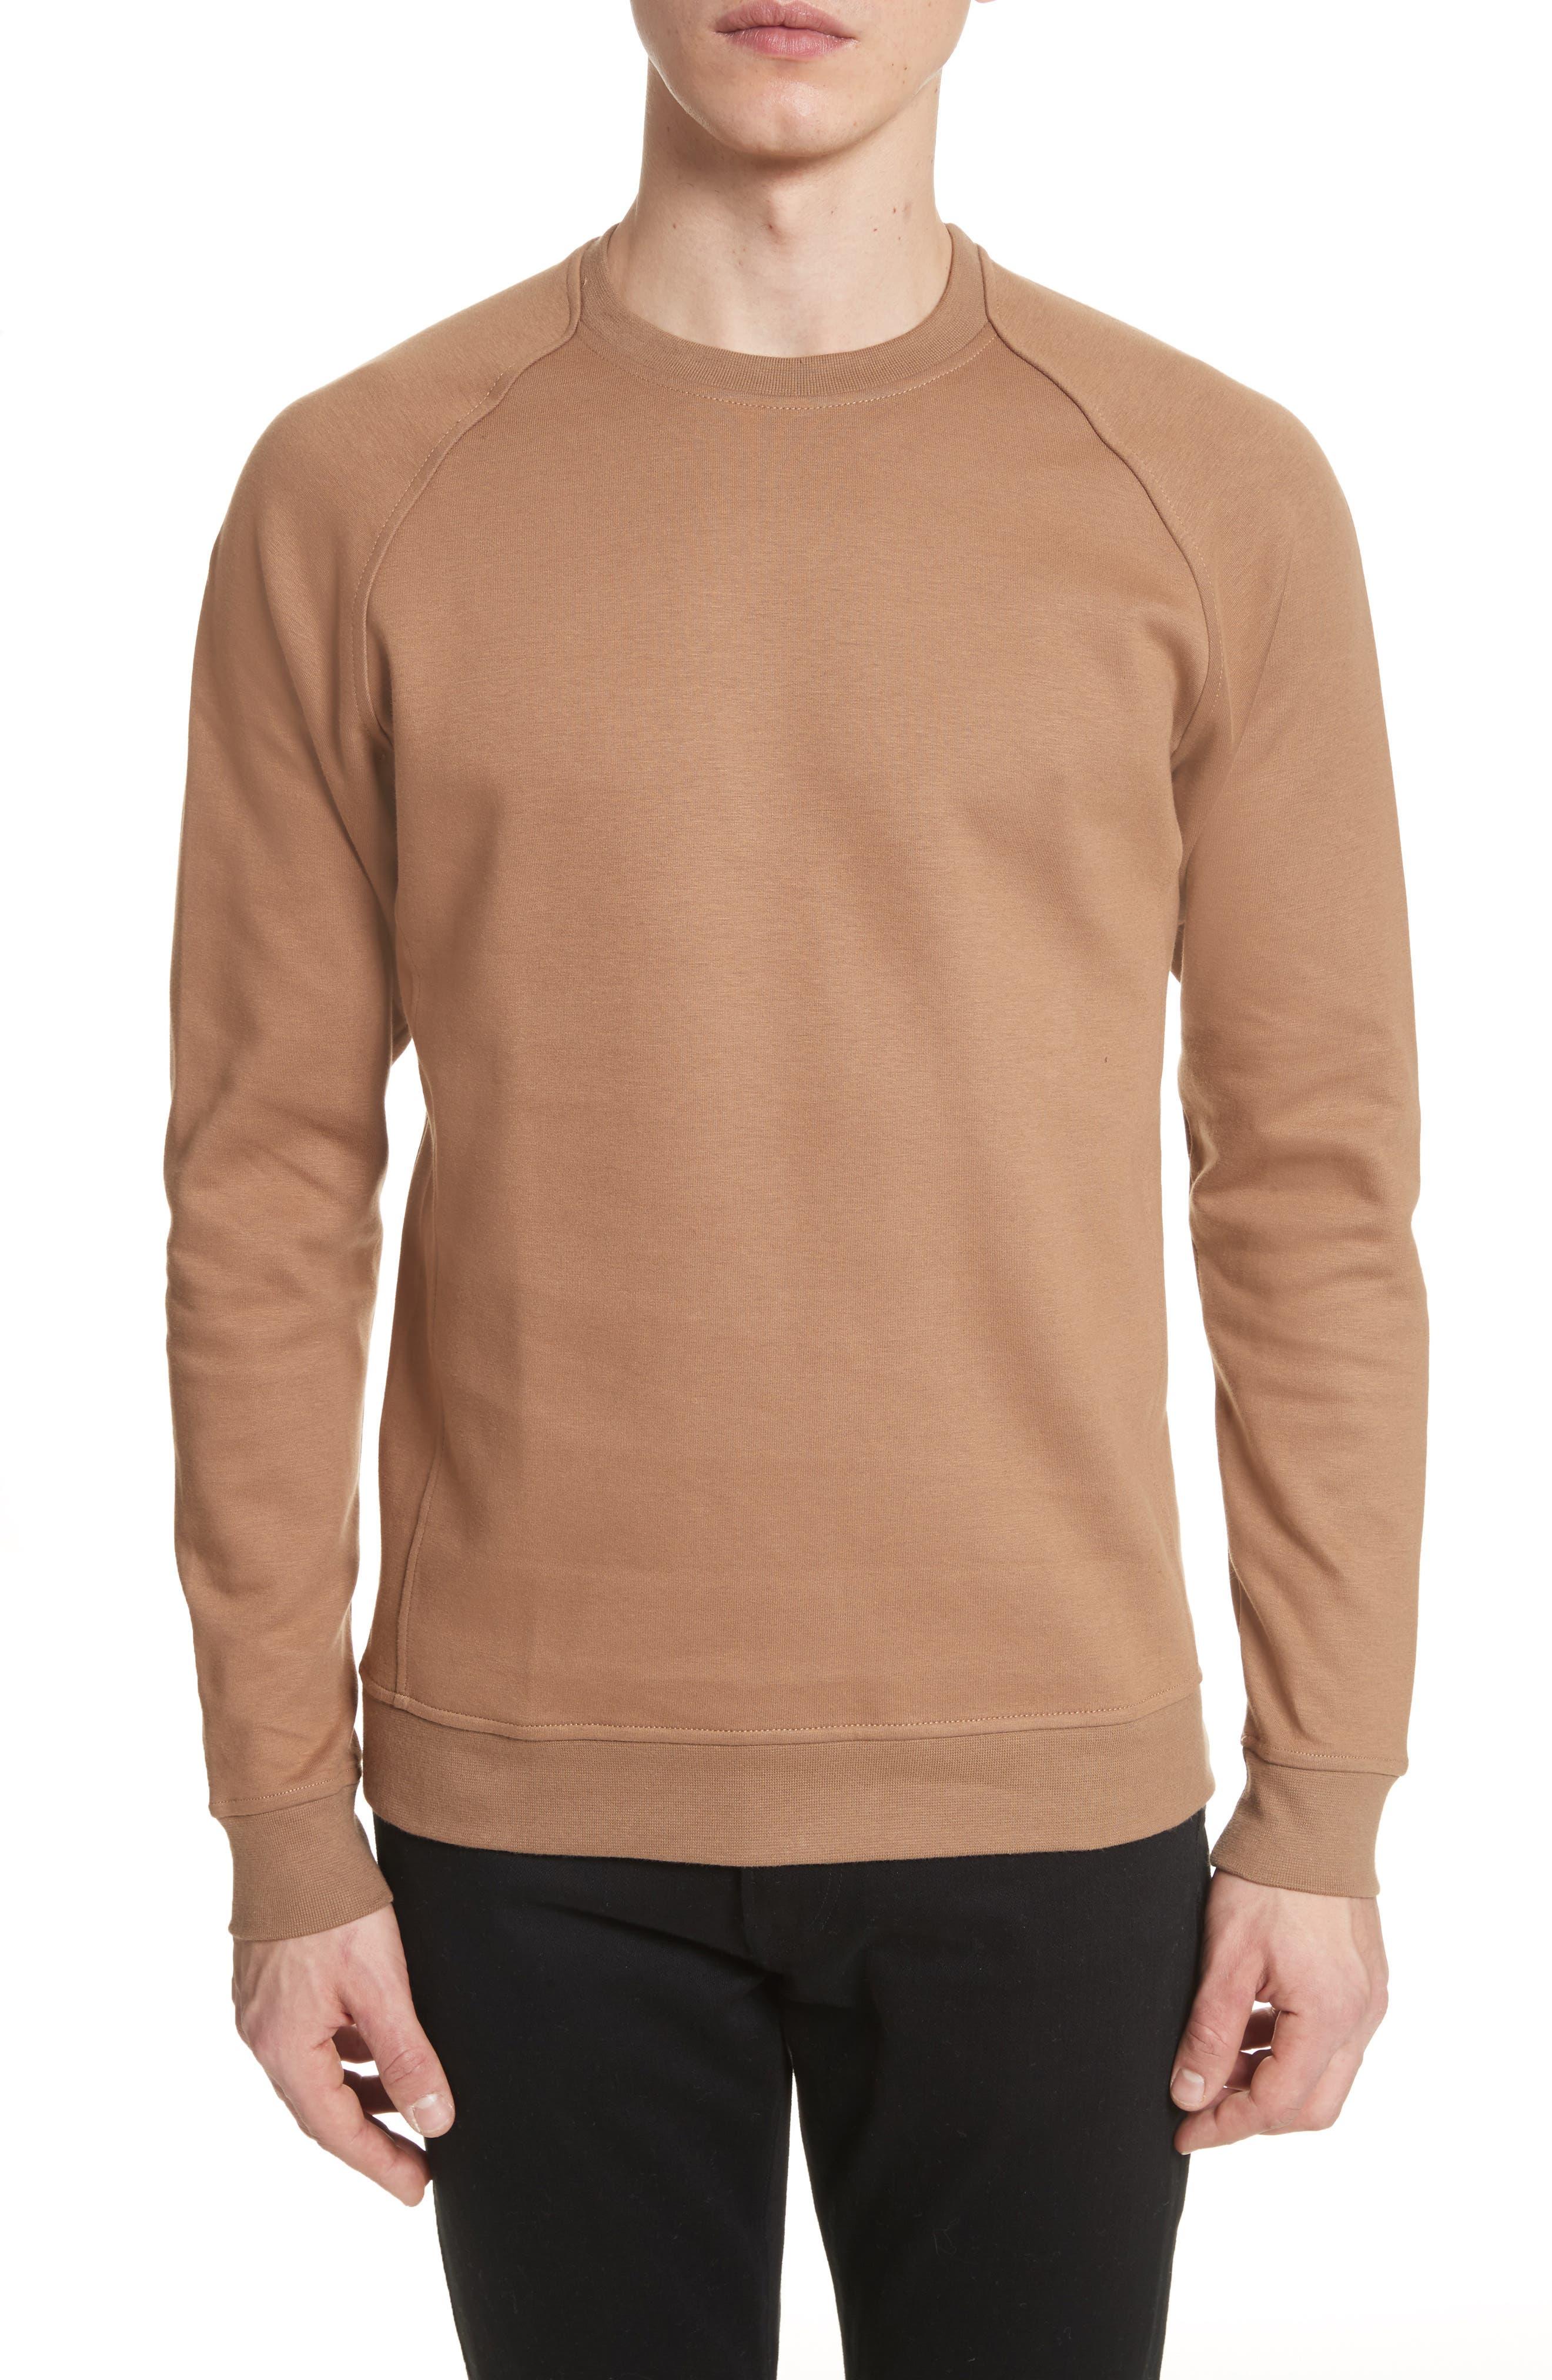 Norse Projects Ketel Dry Mercerized Crewneck Sweatshirt